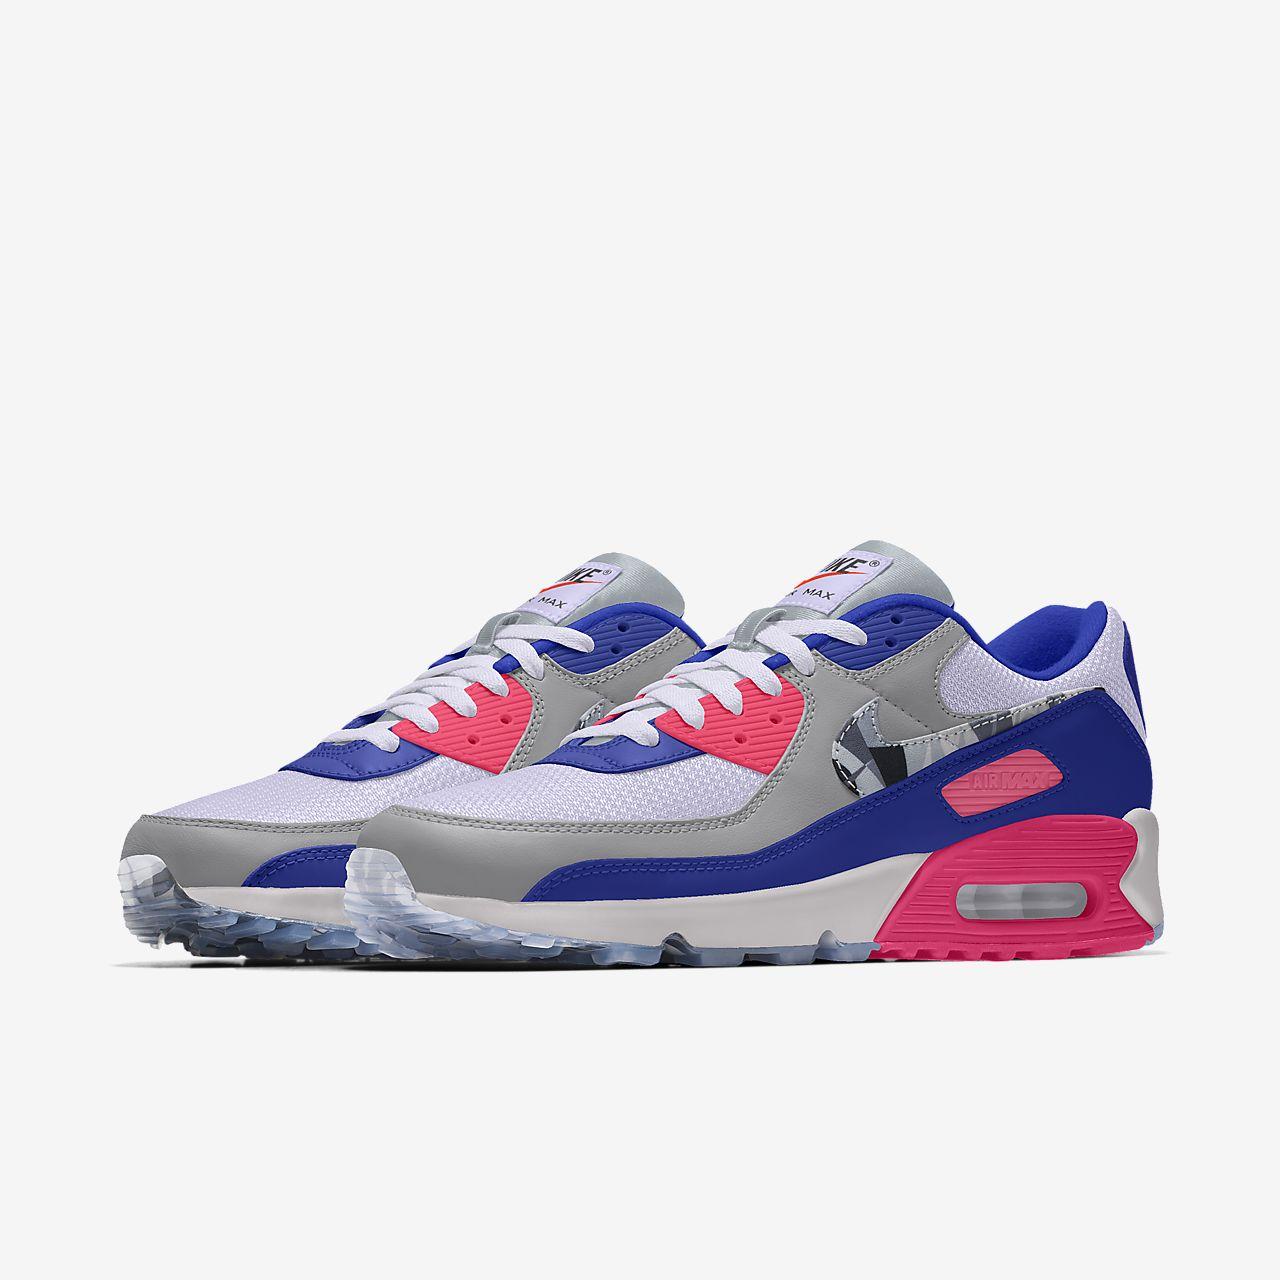 Nike Air Max 90 Premium By You Custom Lifestyle Shoe